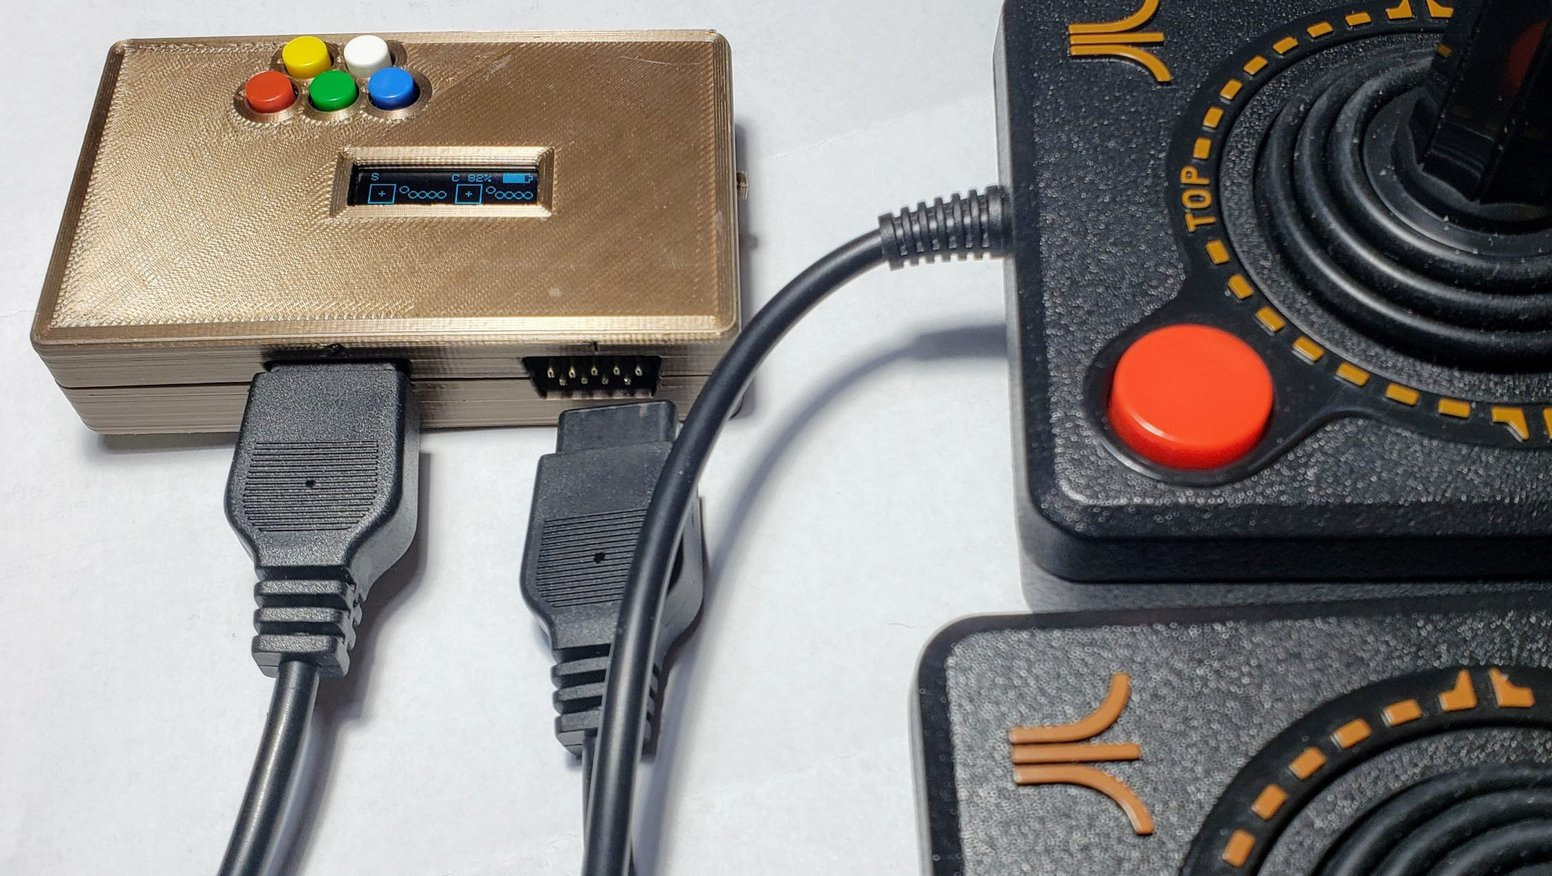 Bluetooth Atari Paddle and Joystick Adapter